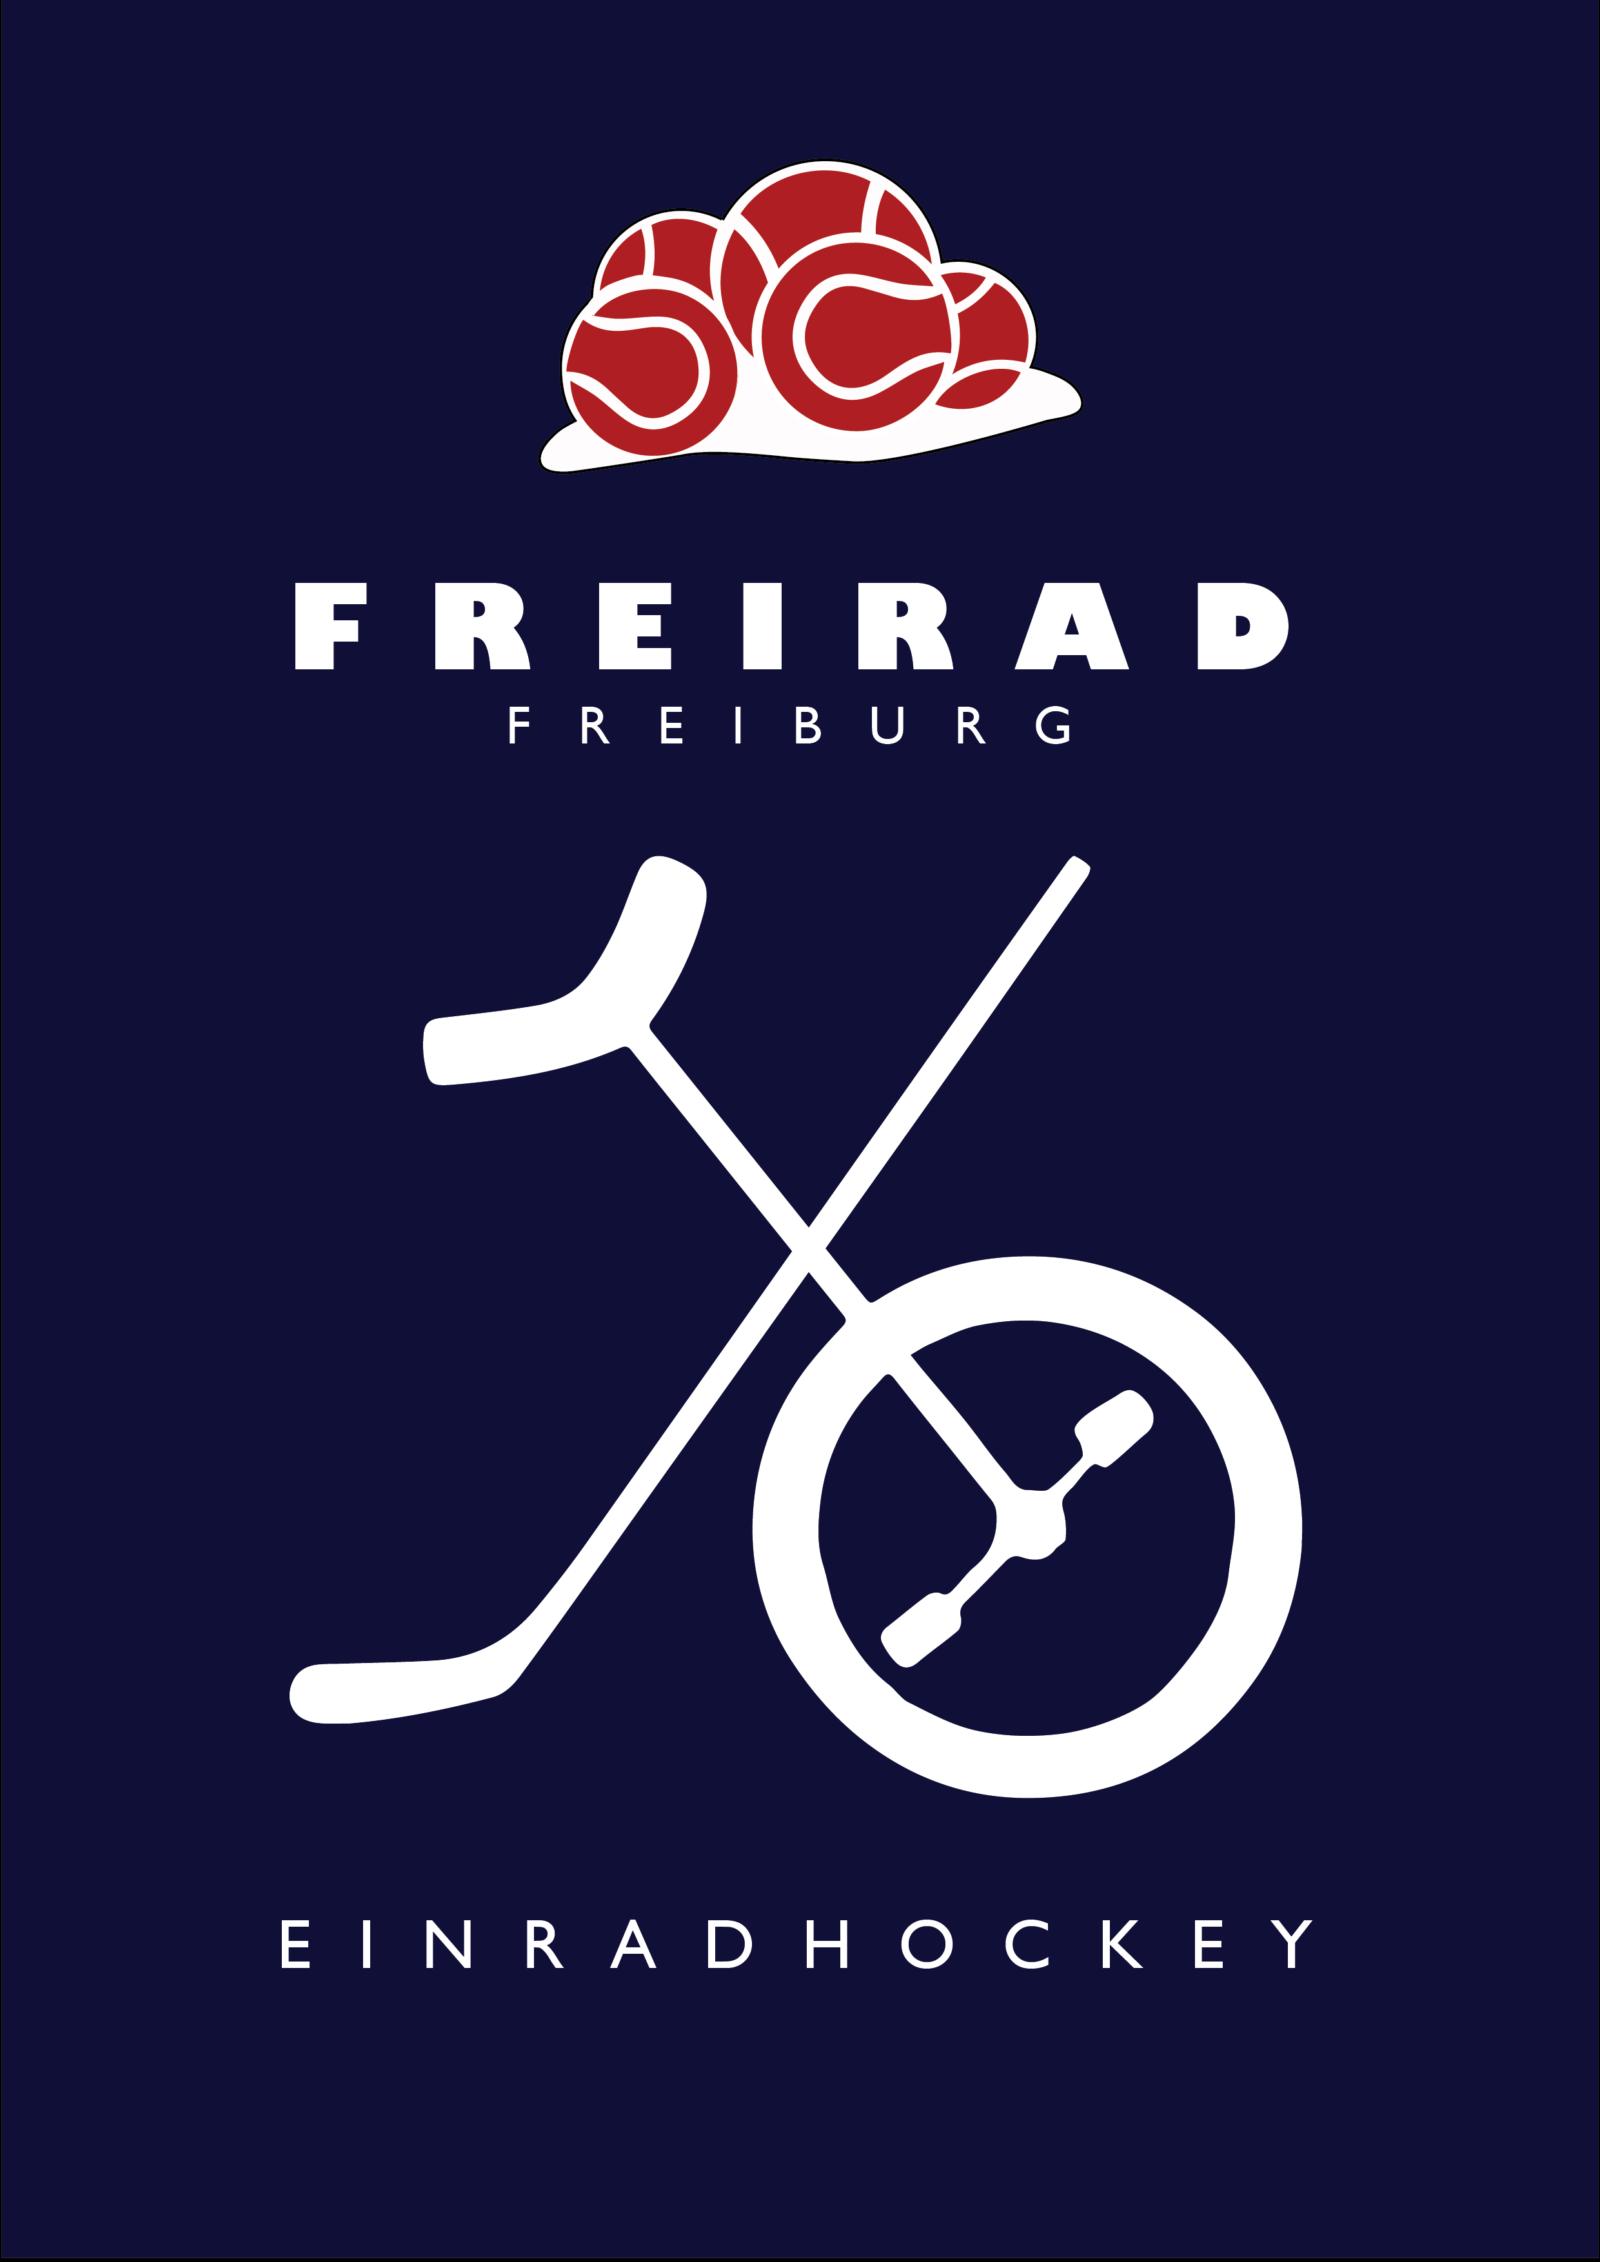 Logo Freirad Freiburg Einradhockey